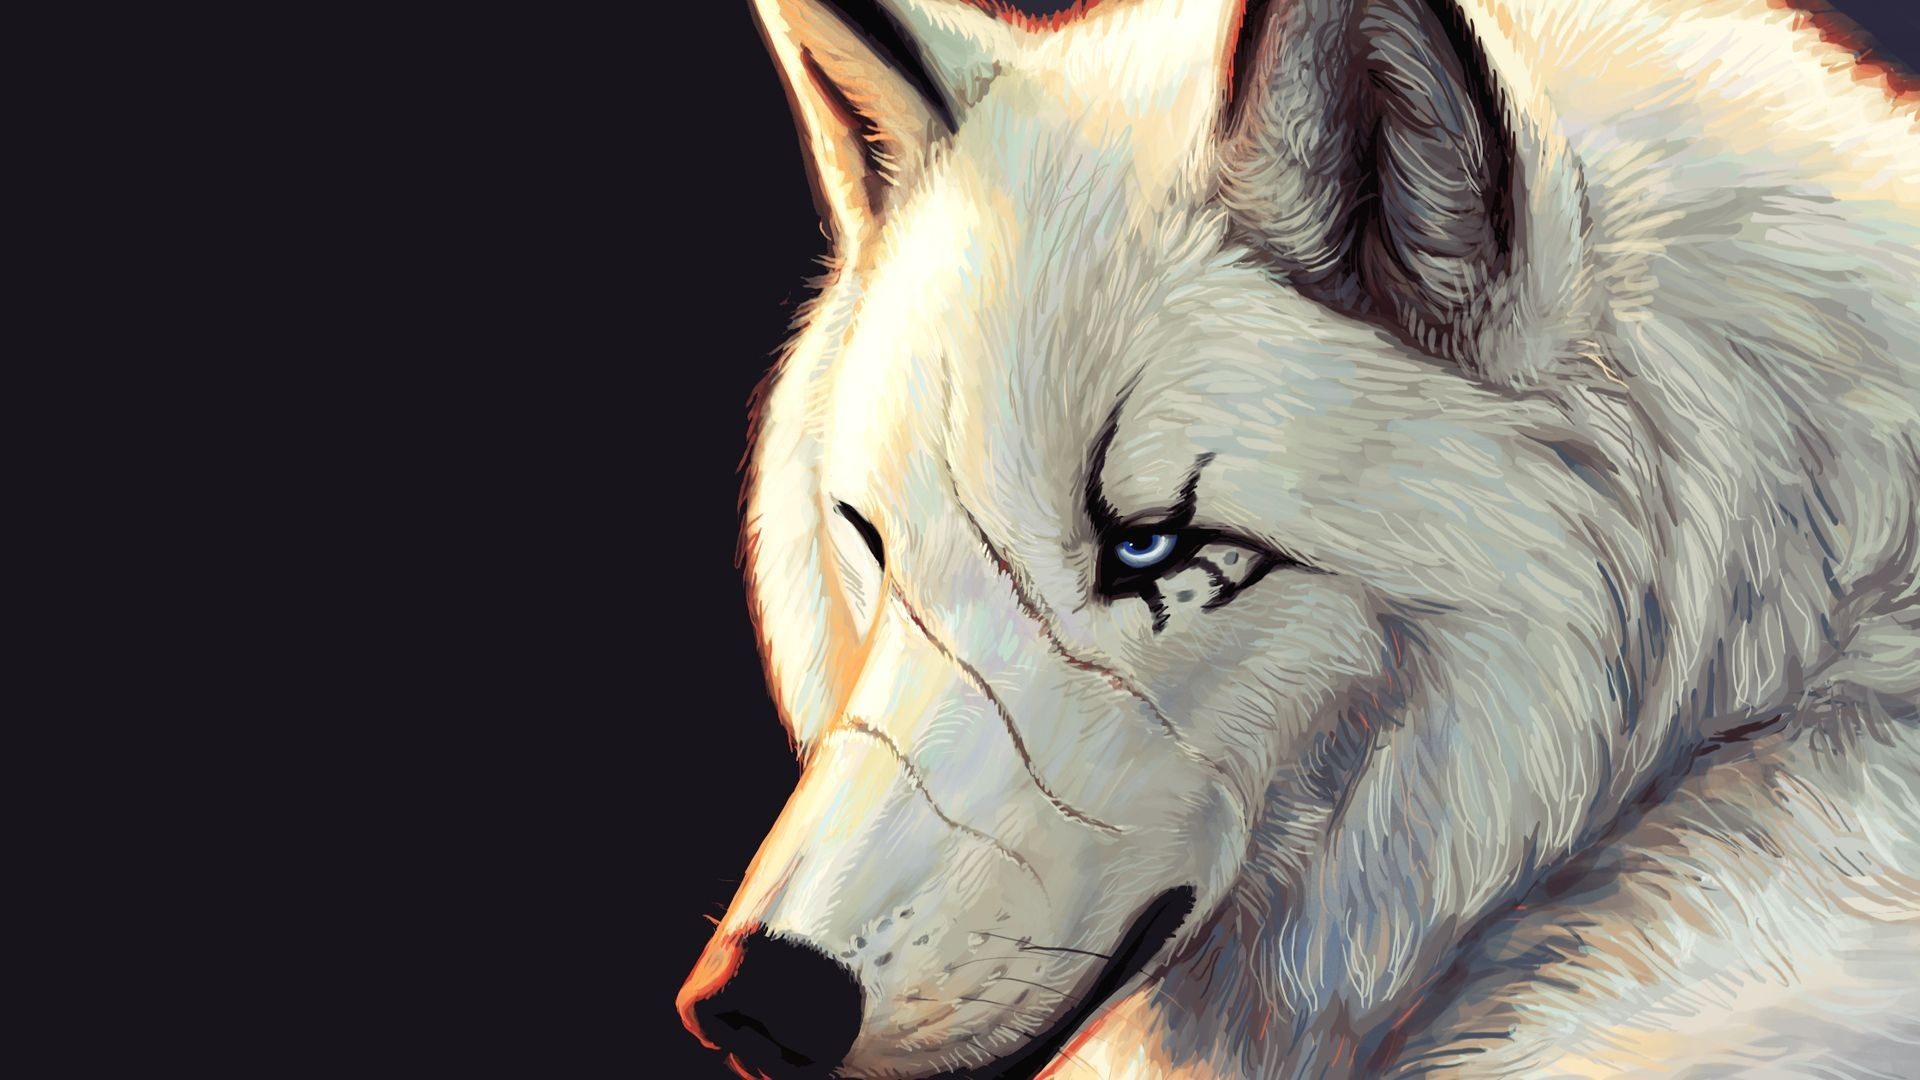 Res: 1920x1080, anime wolf pics dowload